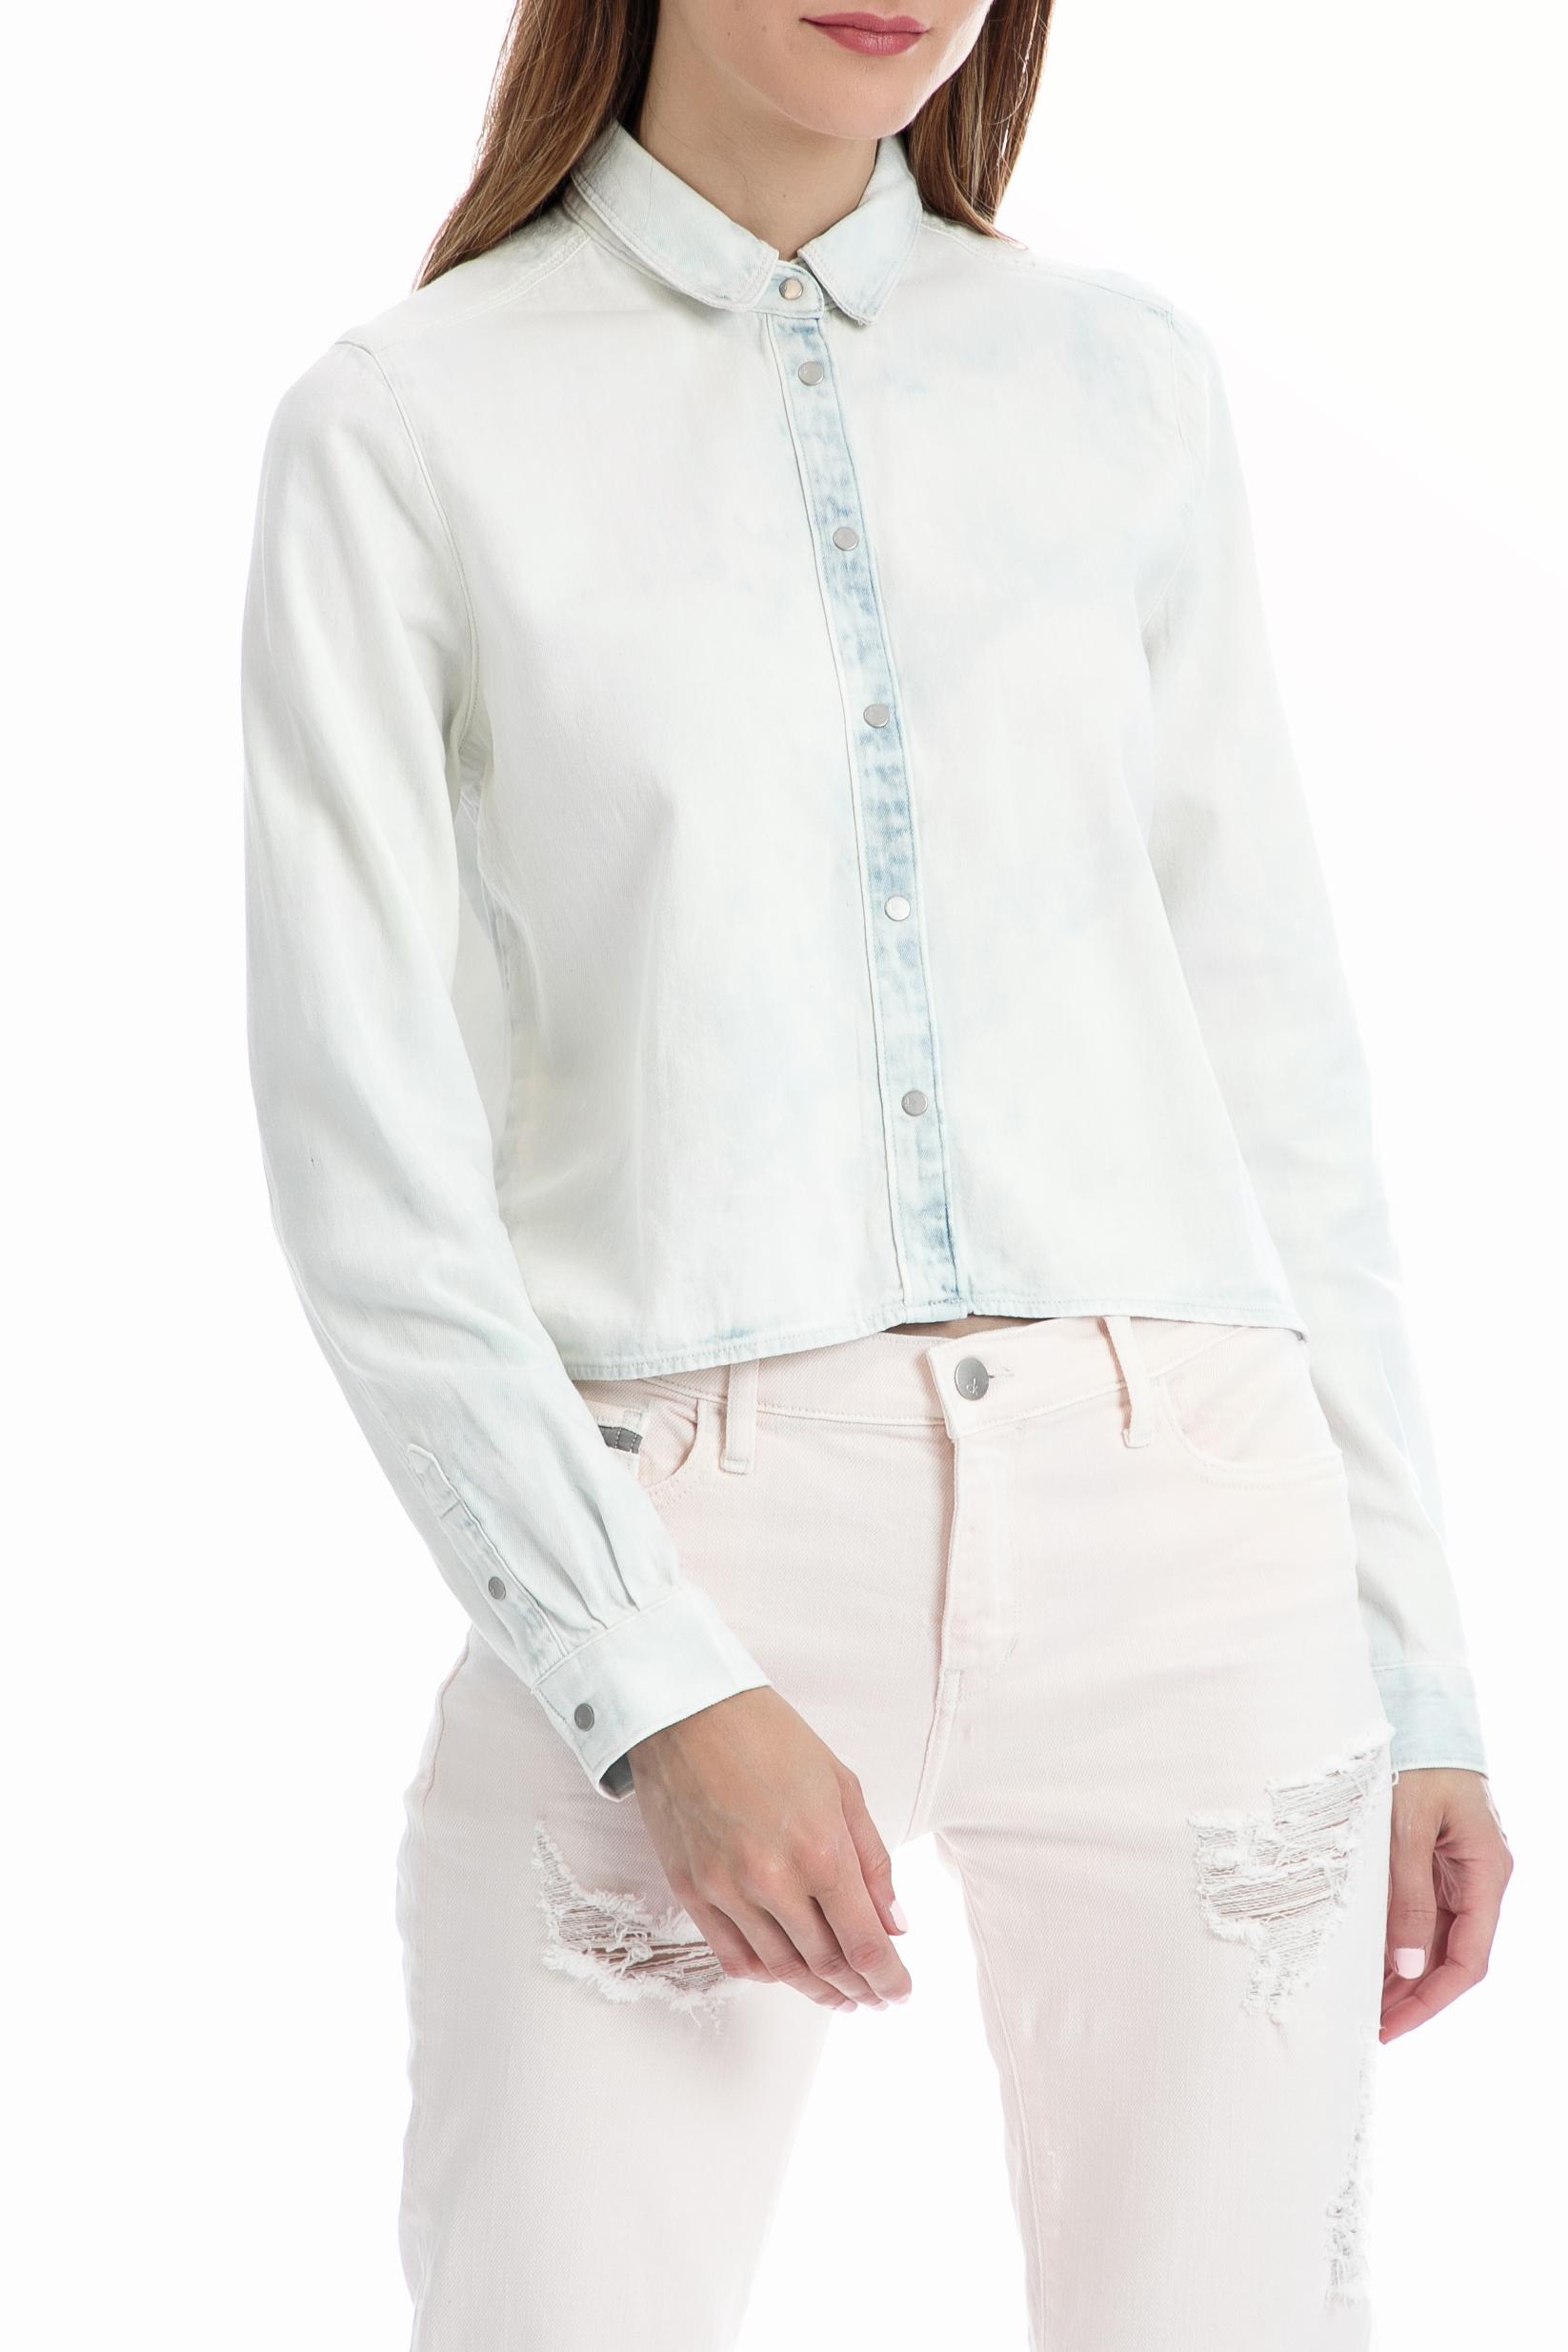 CALVIN KLEIN JEANS - Γυναικείο πουκάμισο CALVIN KLEIN JEANS λευκό γυναικεία ρούχα πουκάμισα μακρυμάνικα